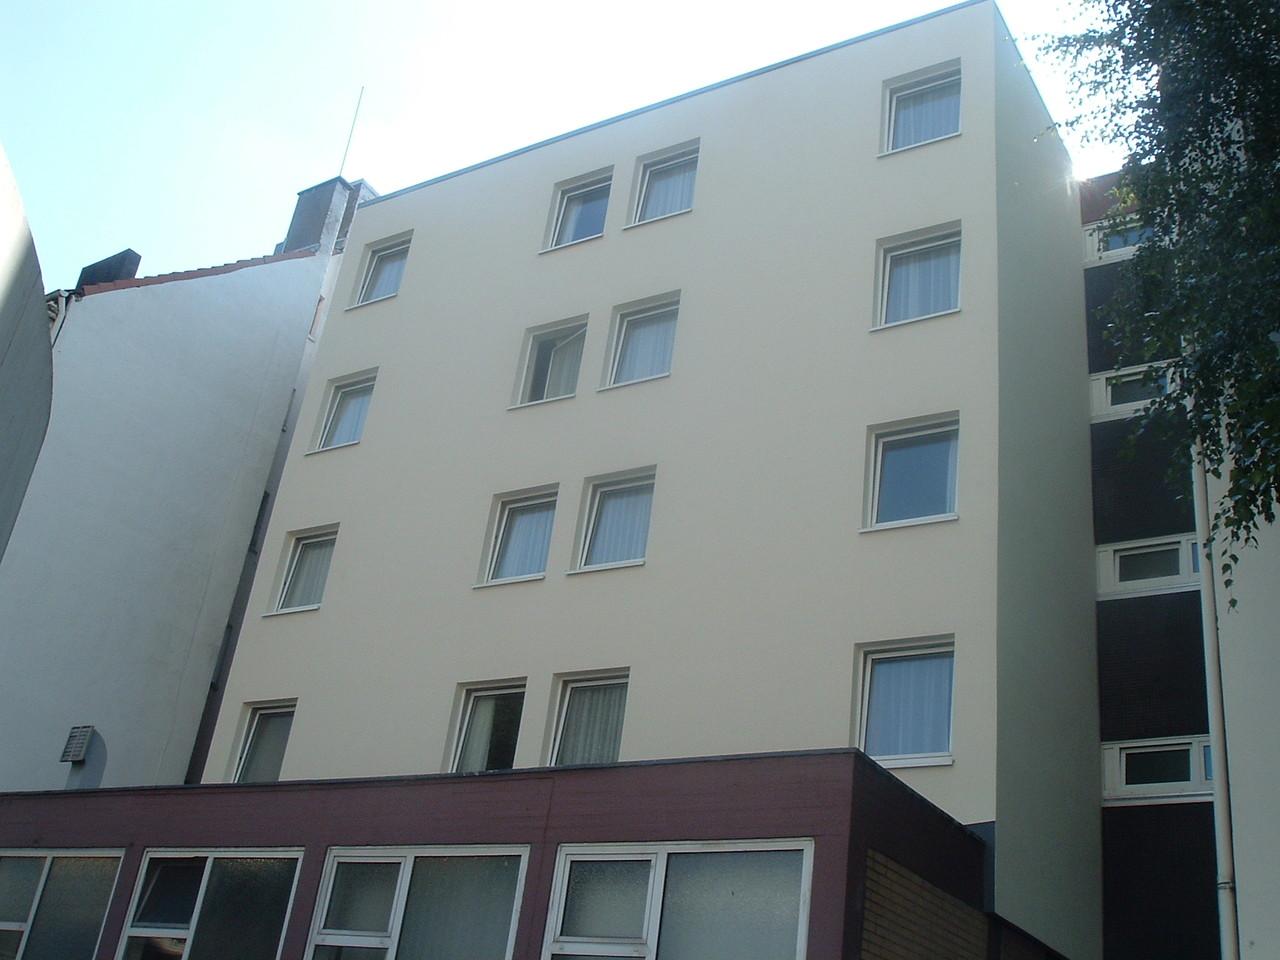 Hotel, Wärmedämmung nachher 2